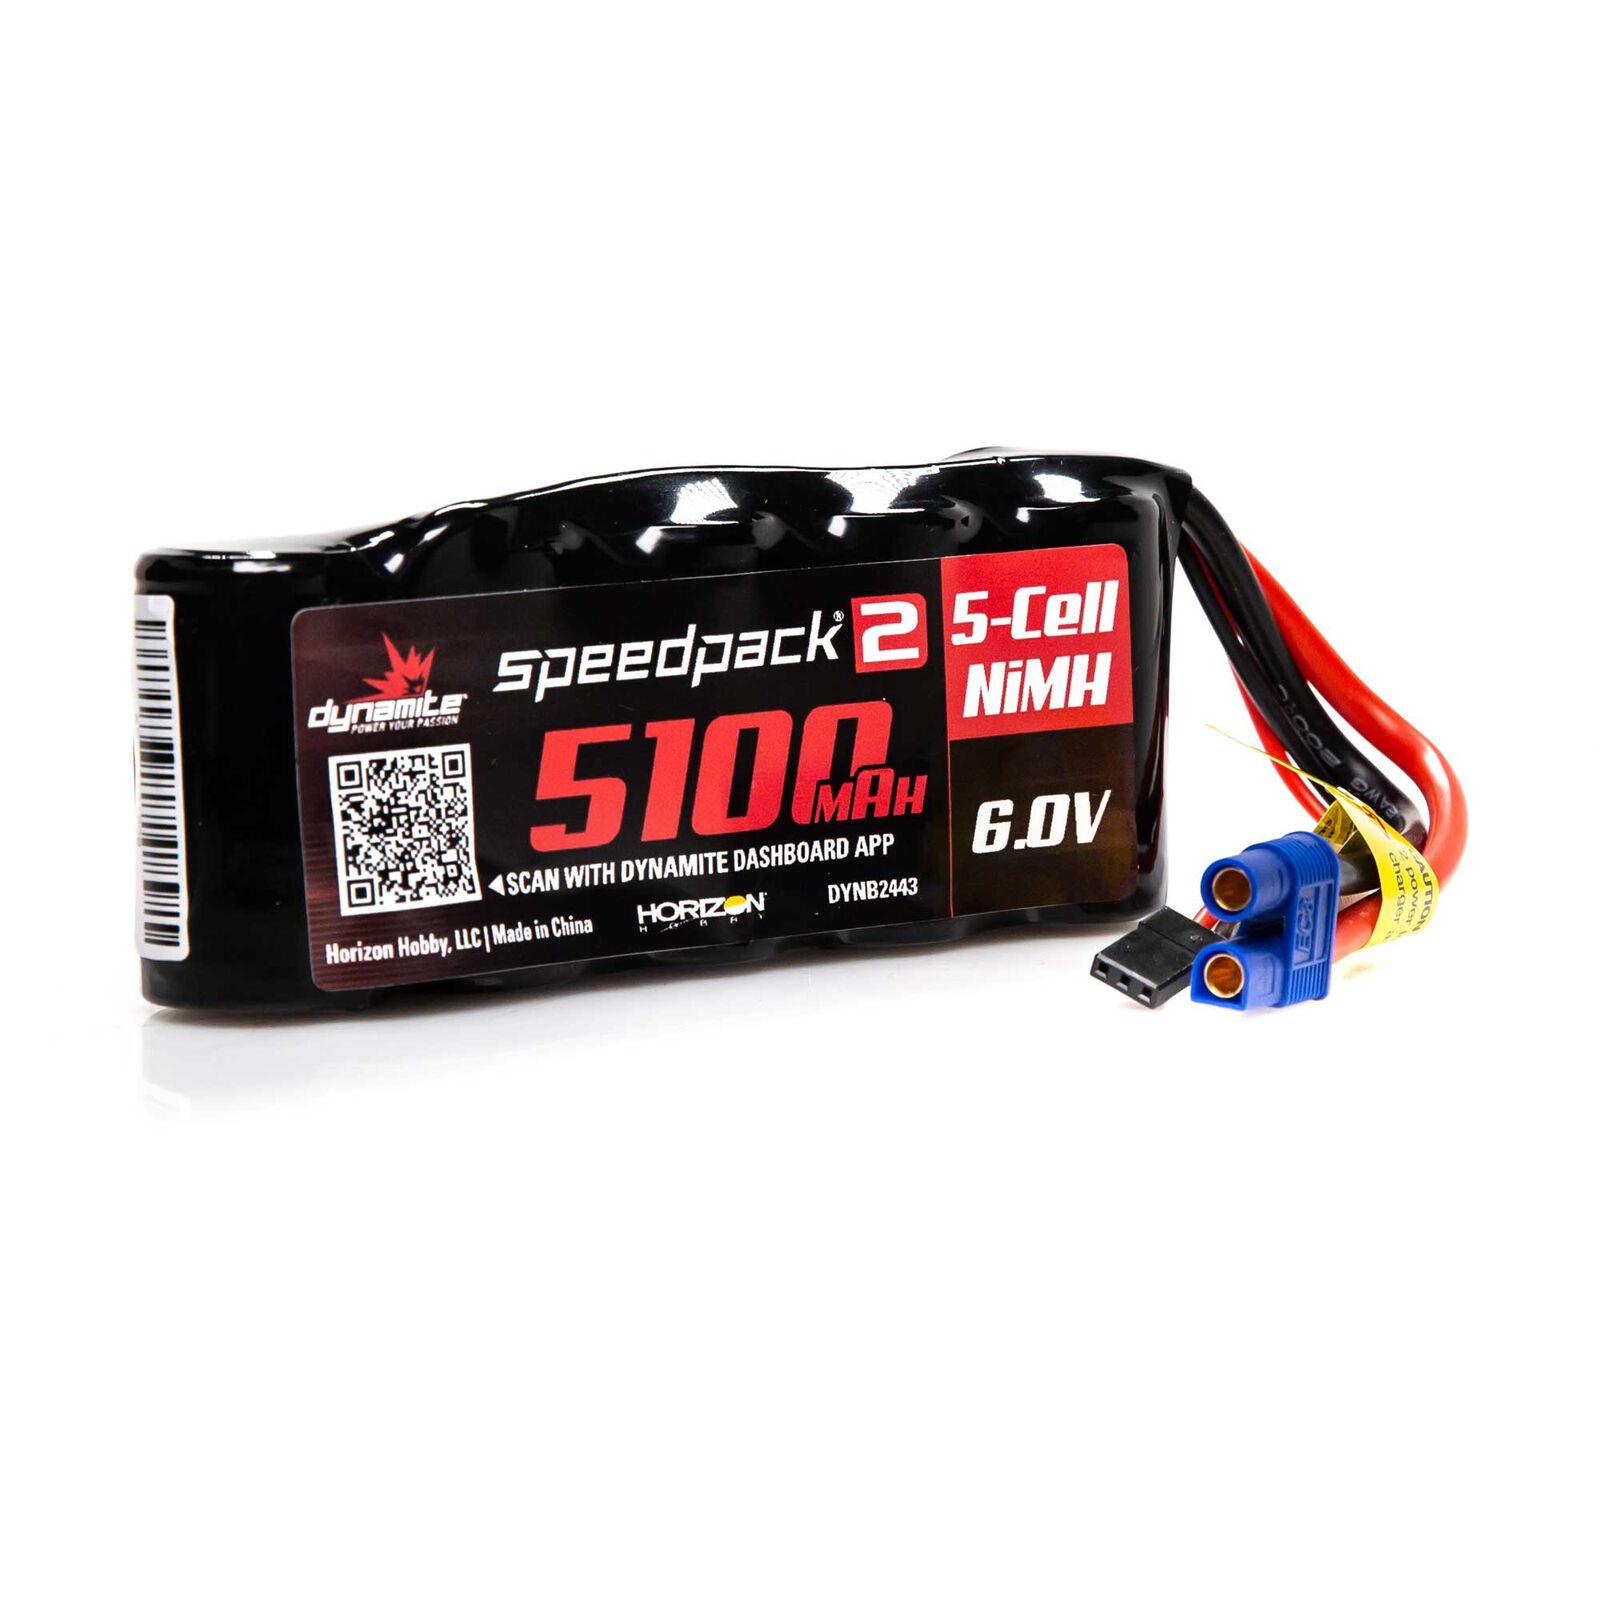 Speedpack2 6V 5100mAh 5C NiMH, Flat Receiver Pack